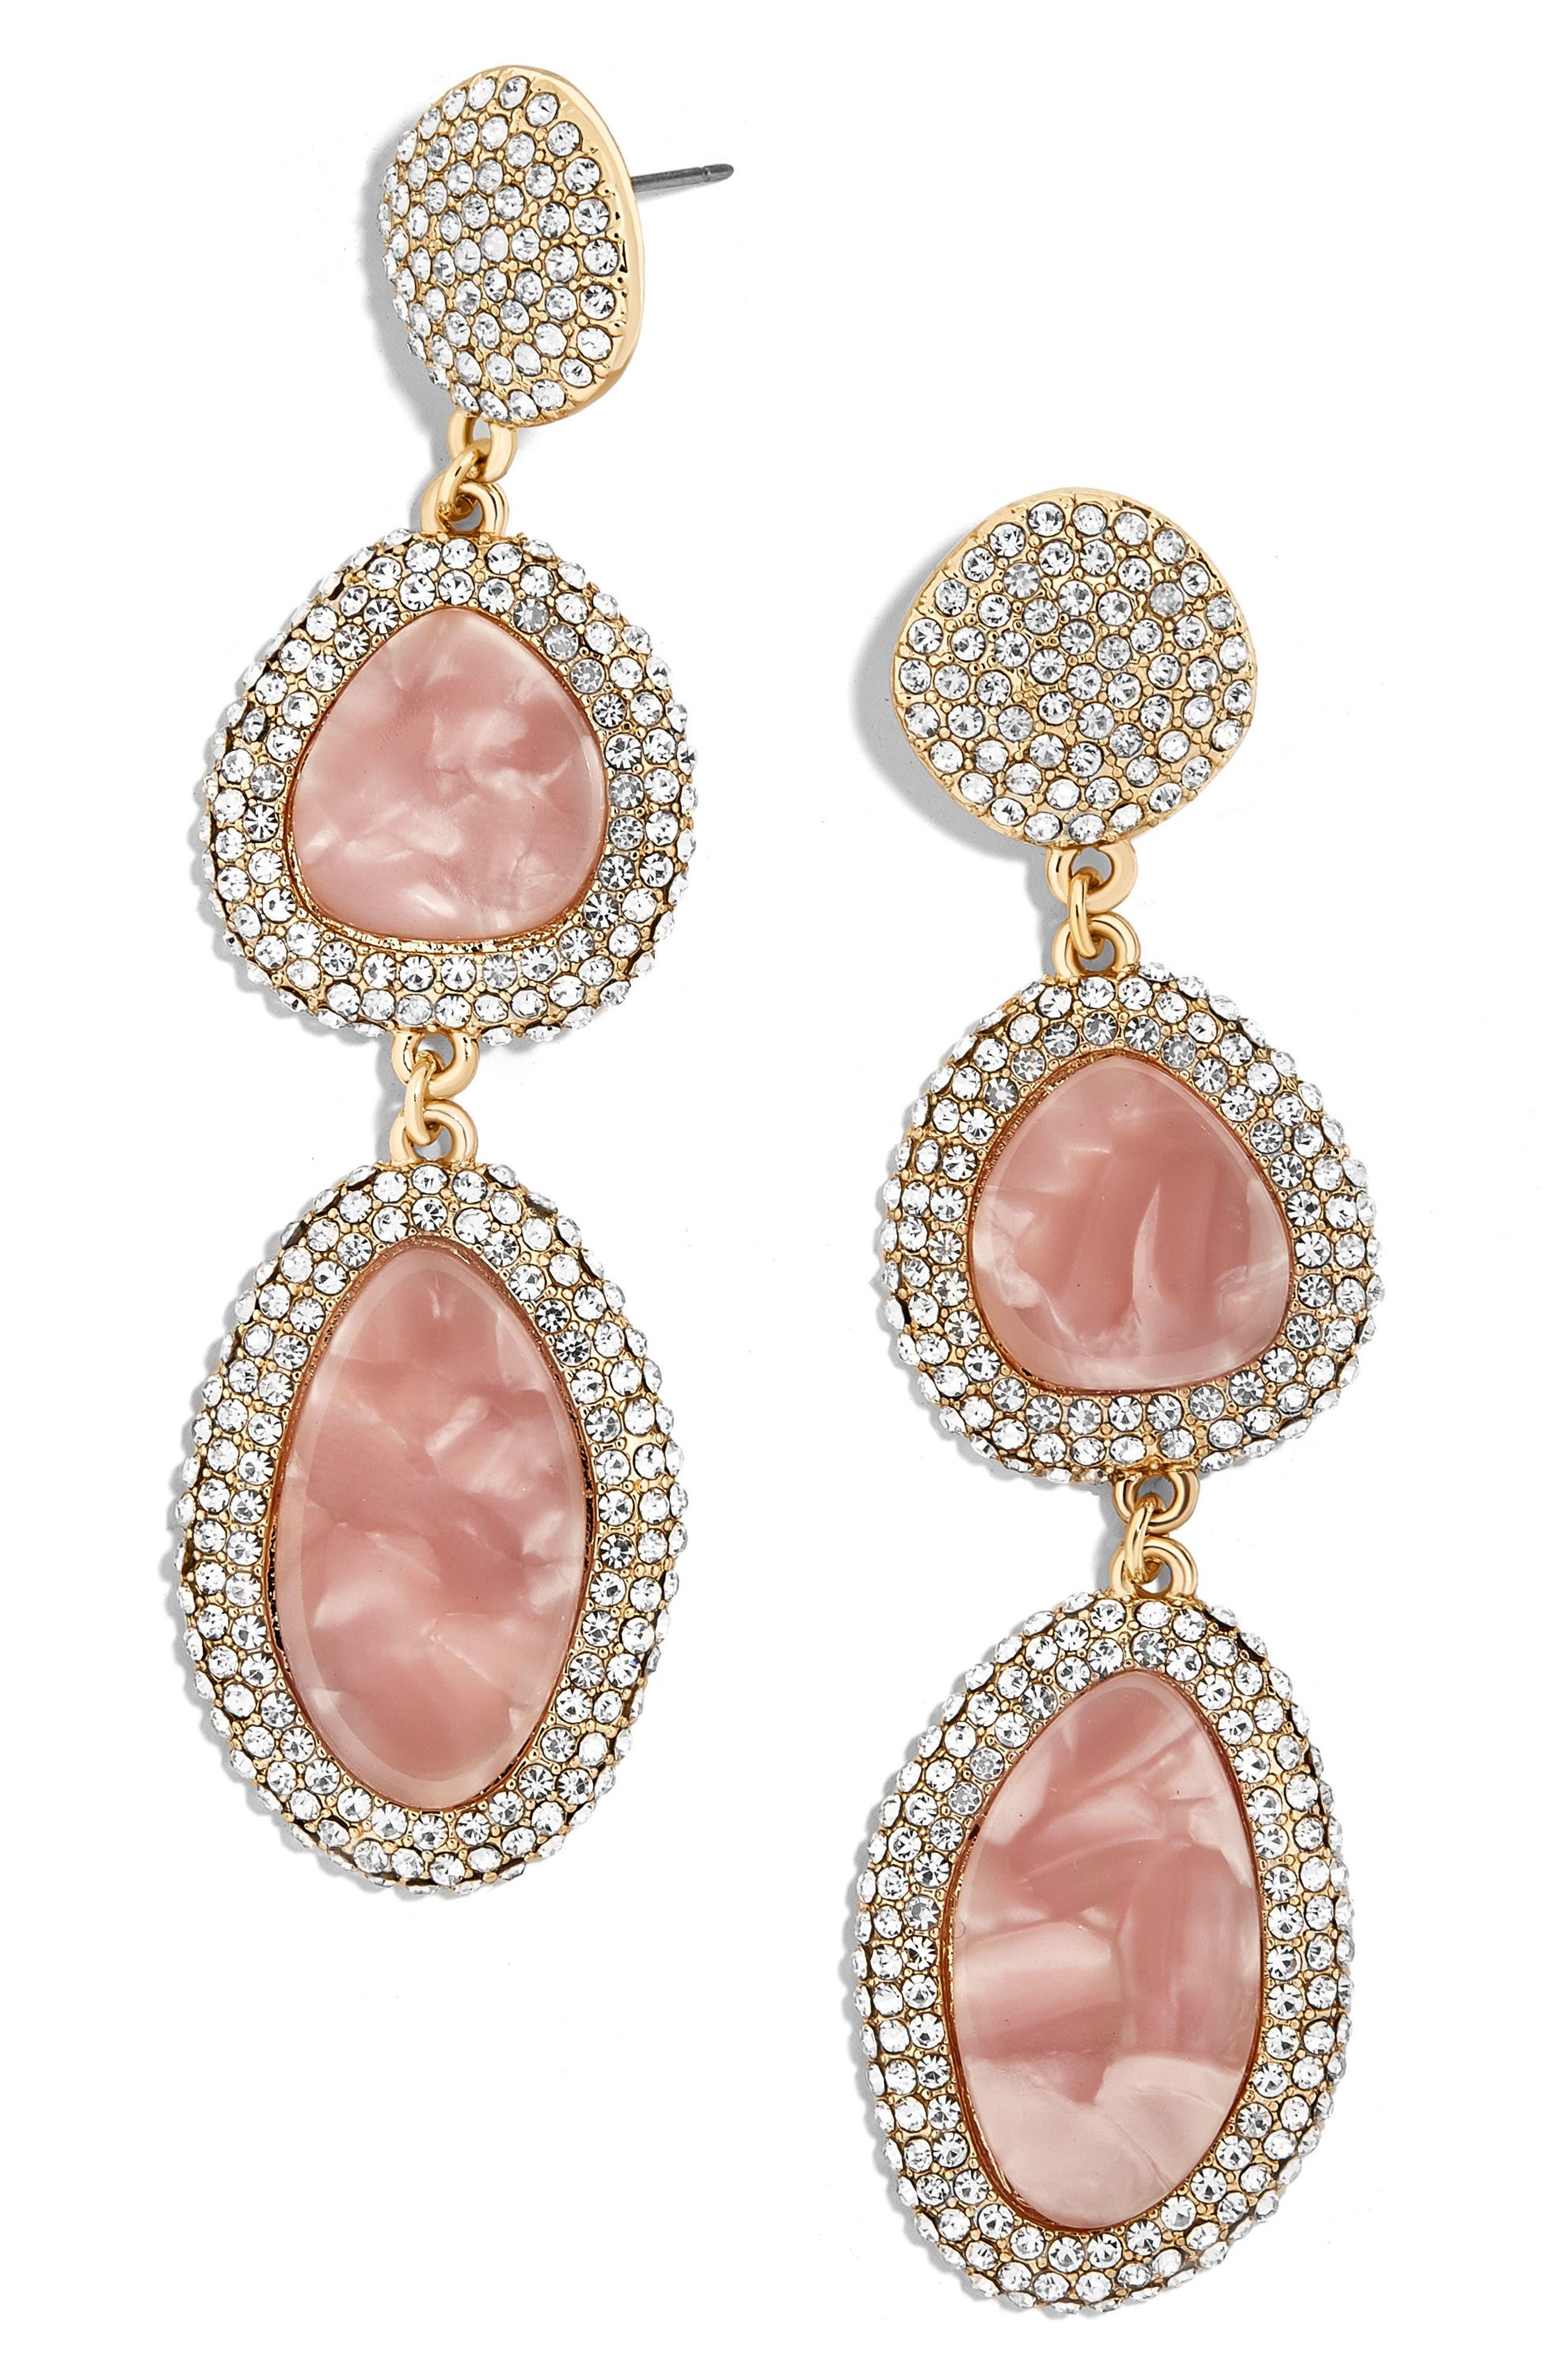 Enity Drop Earrings,                             Main thumbnail 1, color,                             Blush